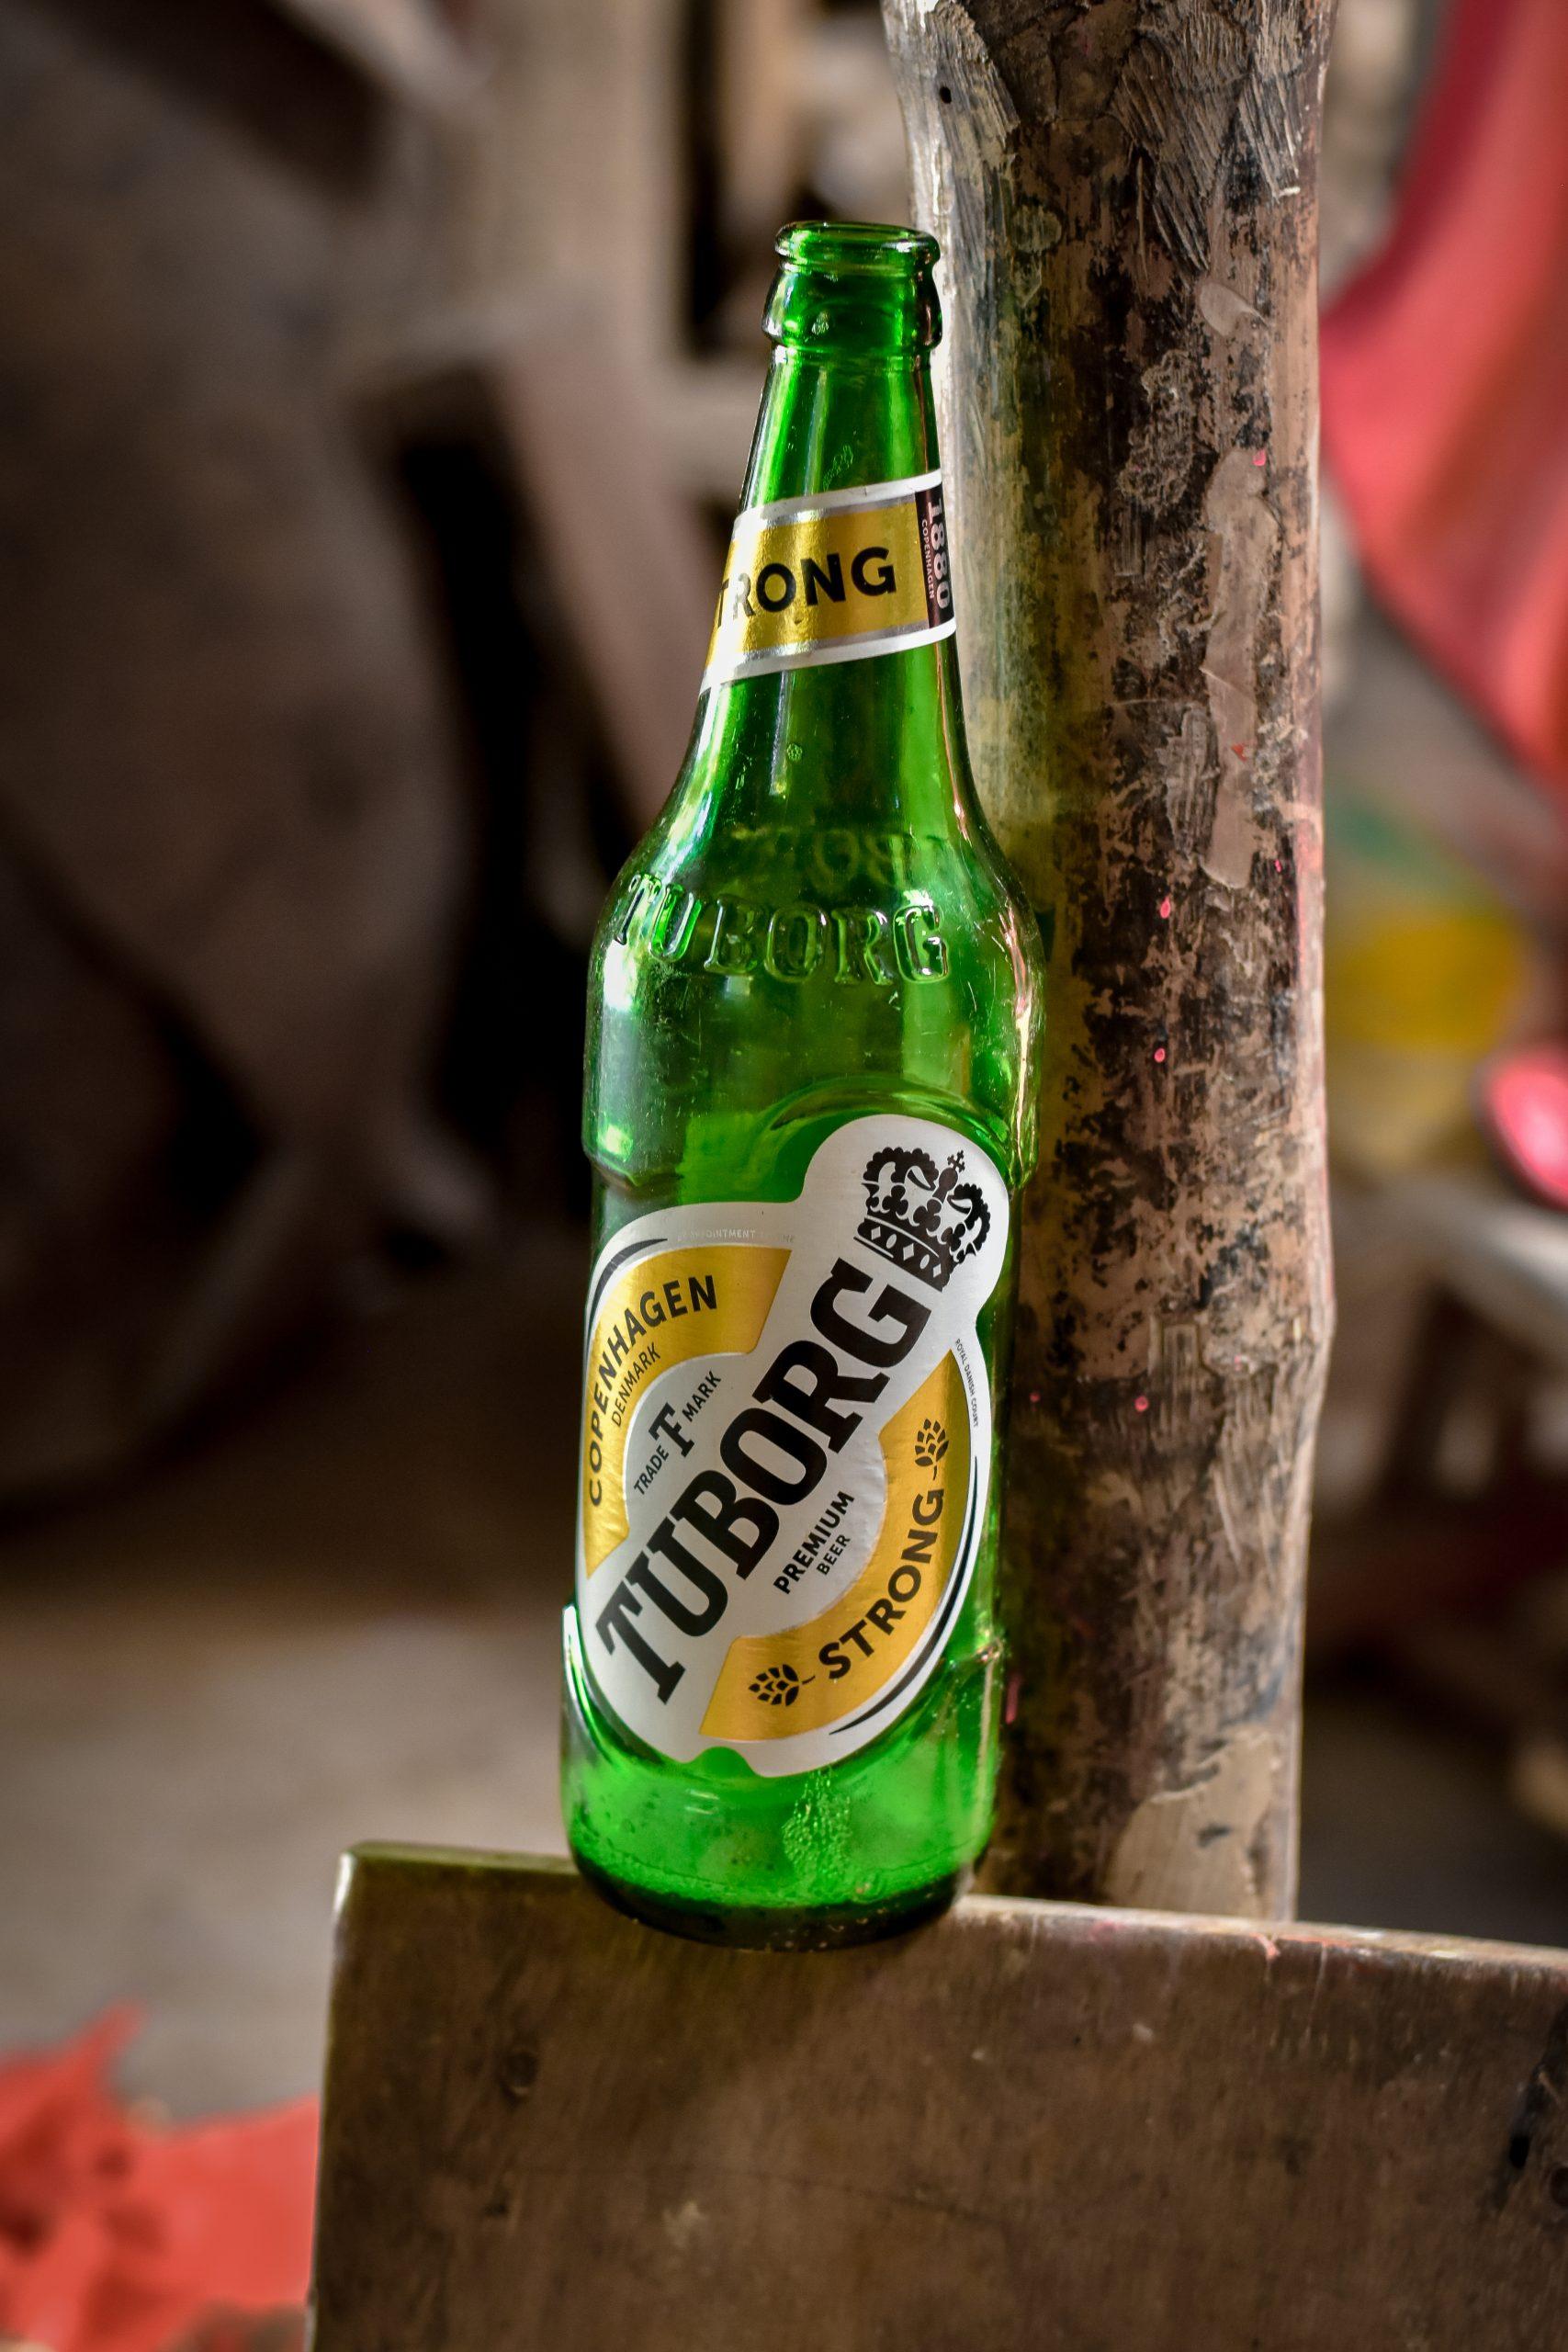 A tuborg bottle image